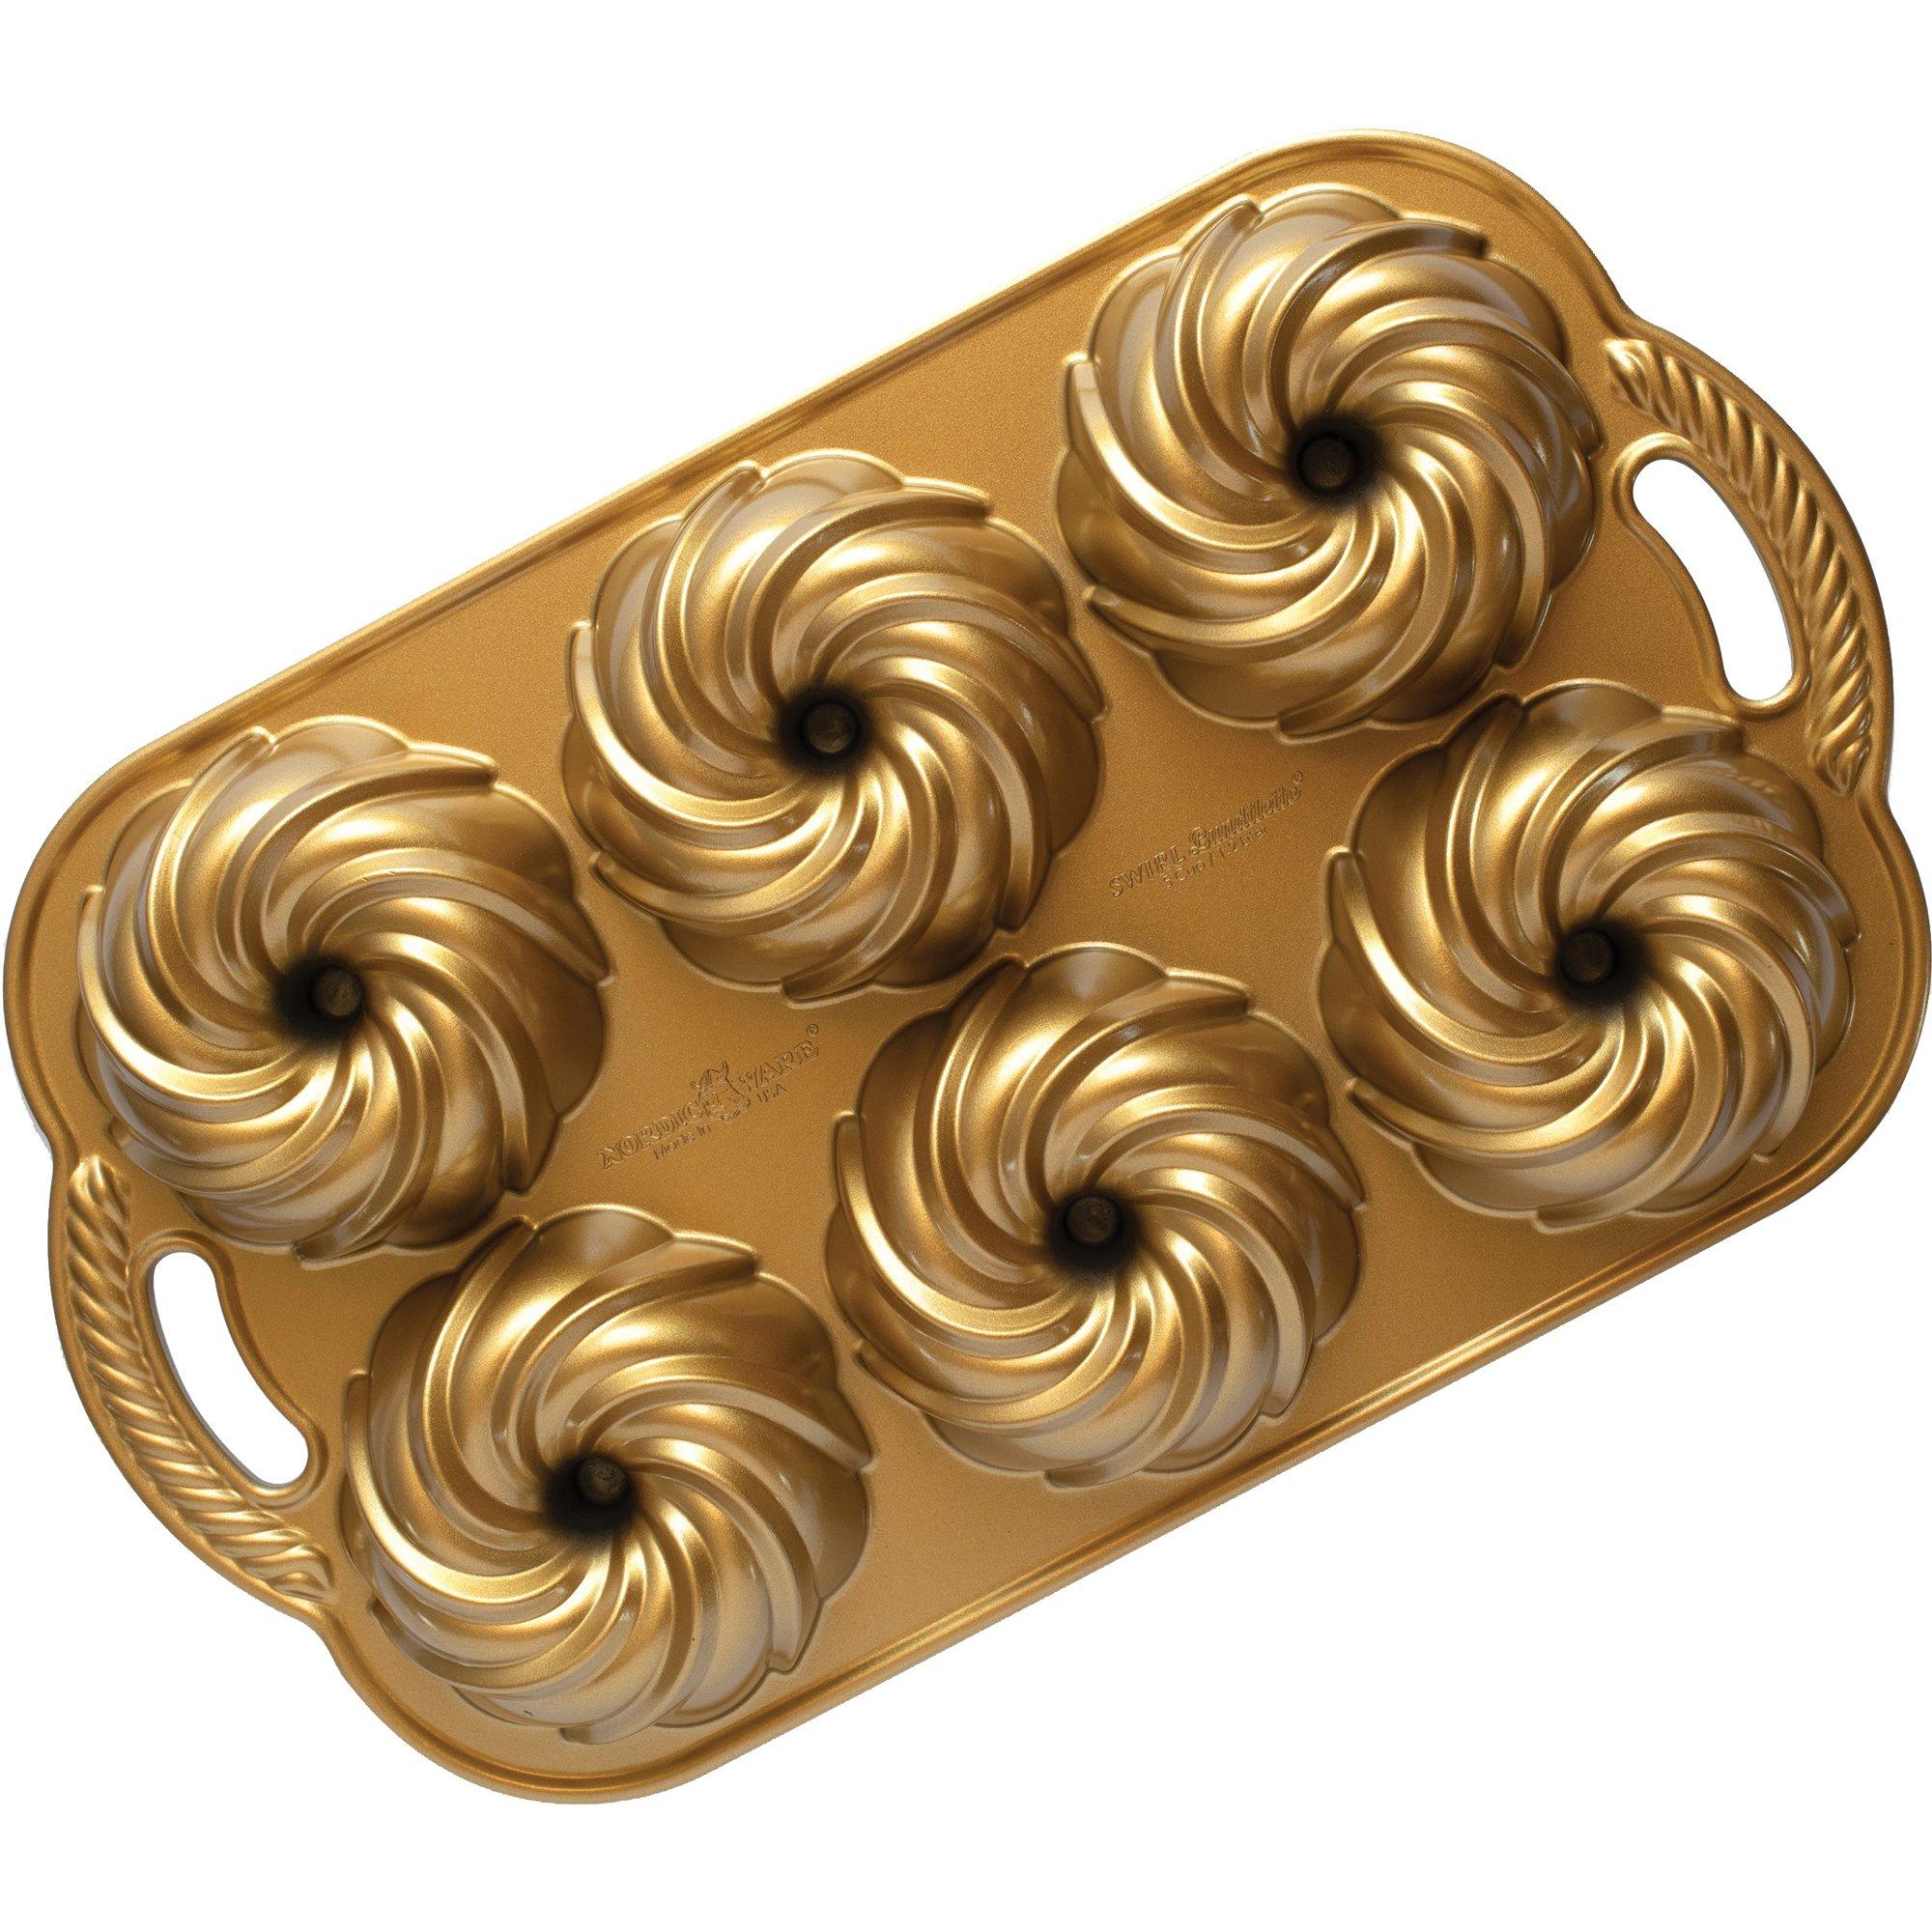 Nordic Ware Swirl Bundtlette Bakform 24 liter